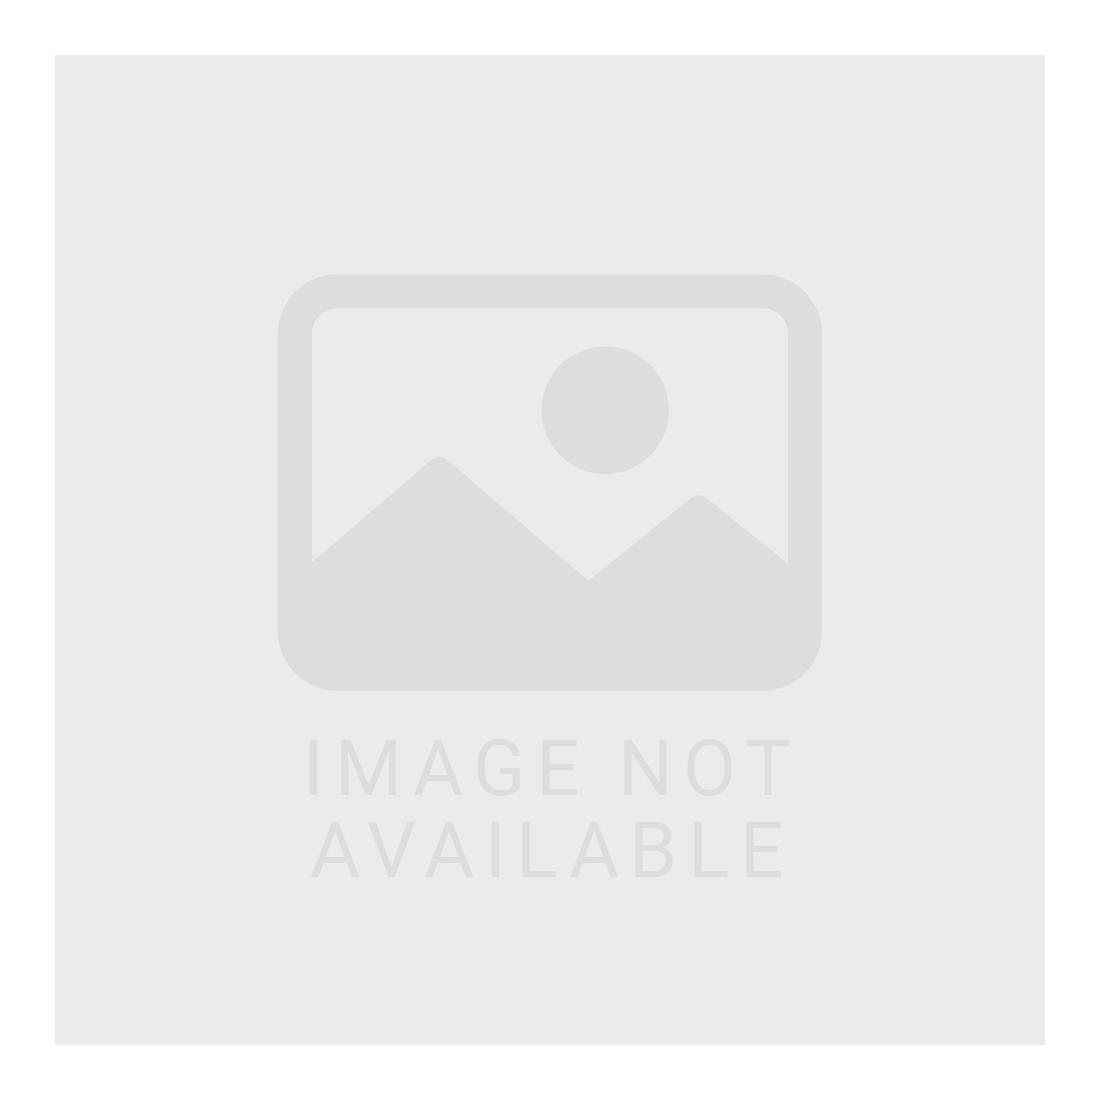 Foam Ear Plug and Case